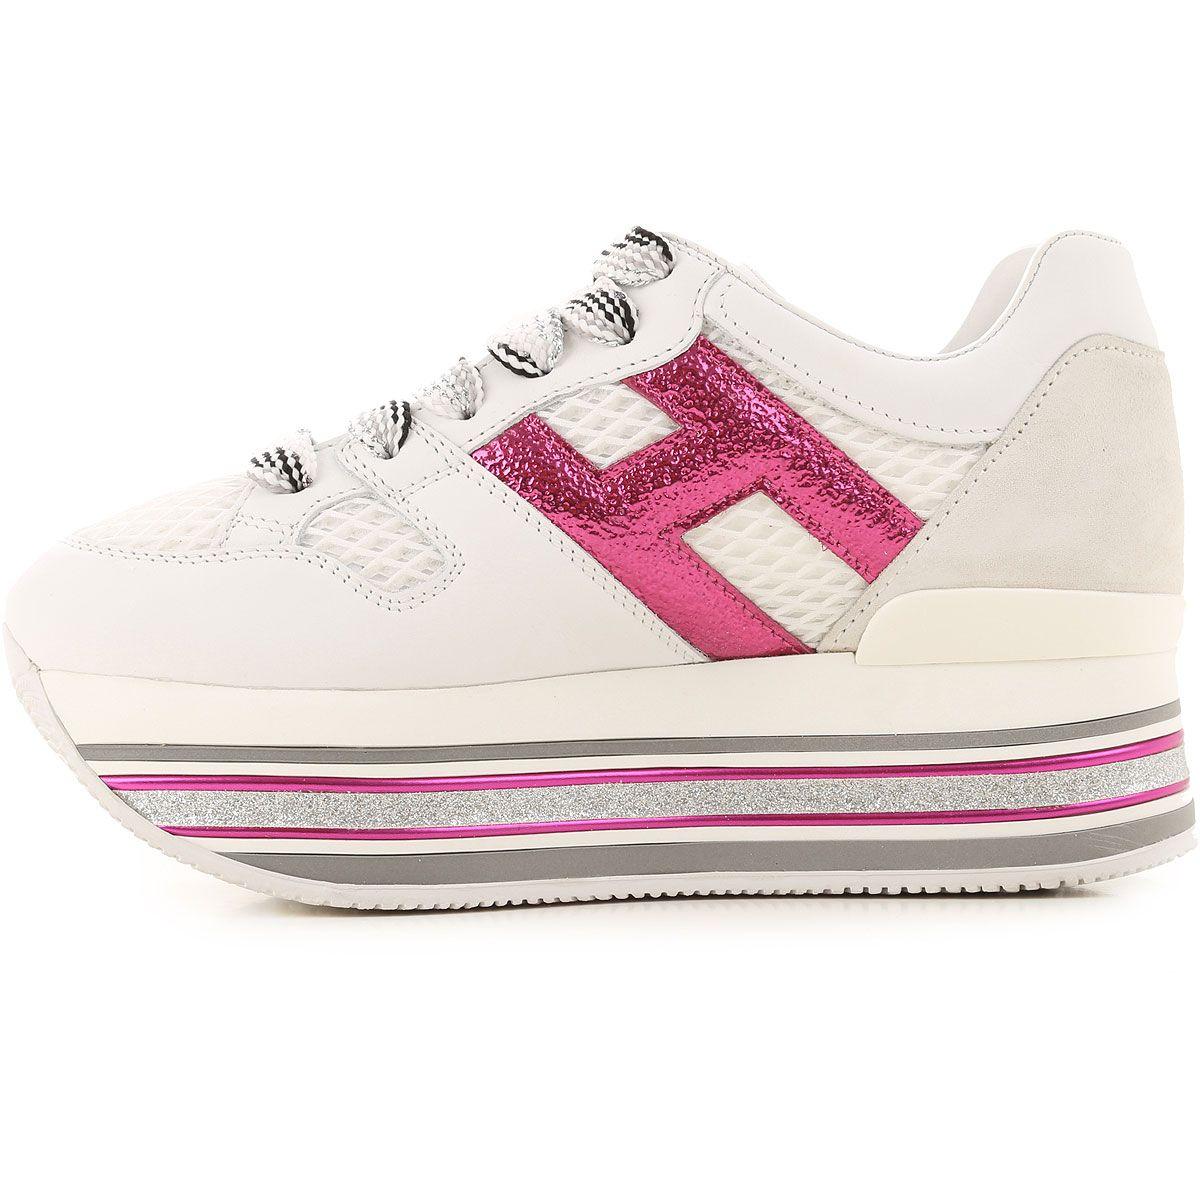 Womens Shoes Hogan, Style code: hxw5160u352n7q0pbq-- in 2021 ...